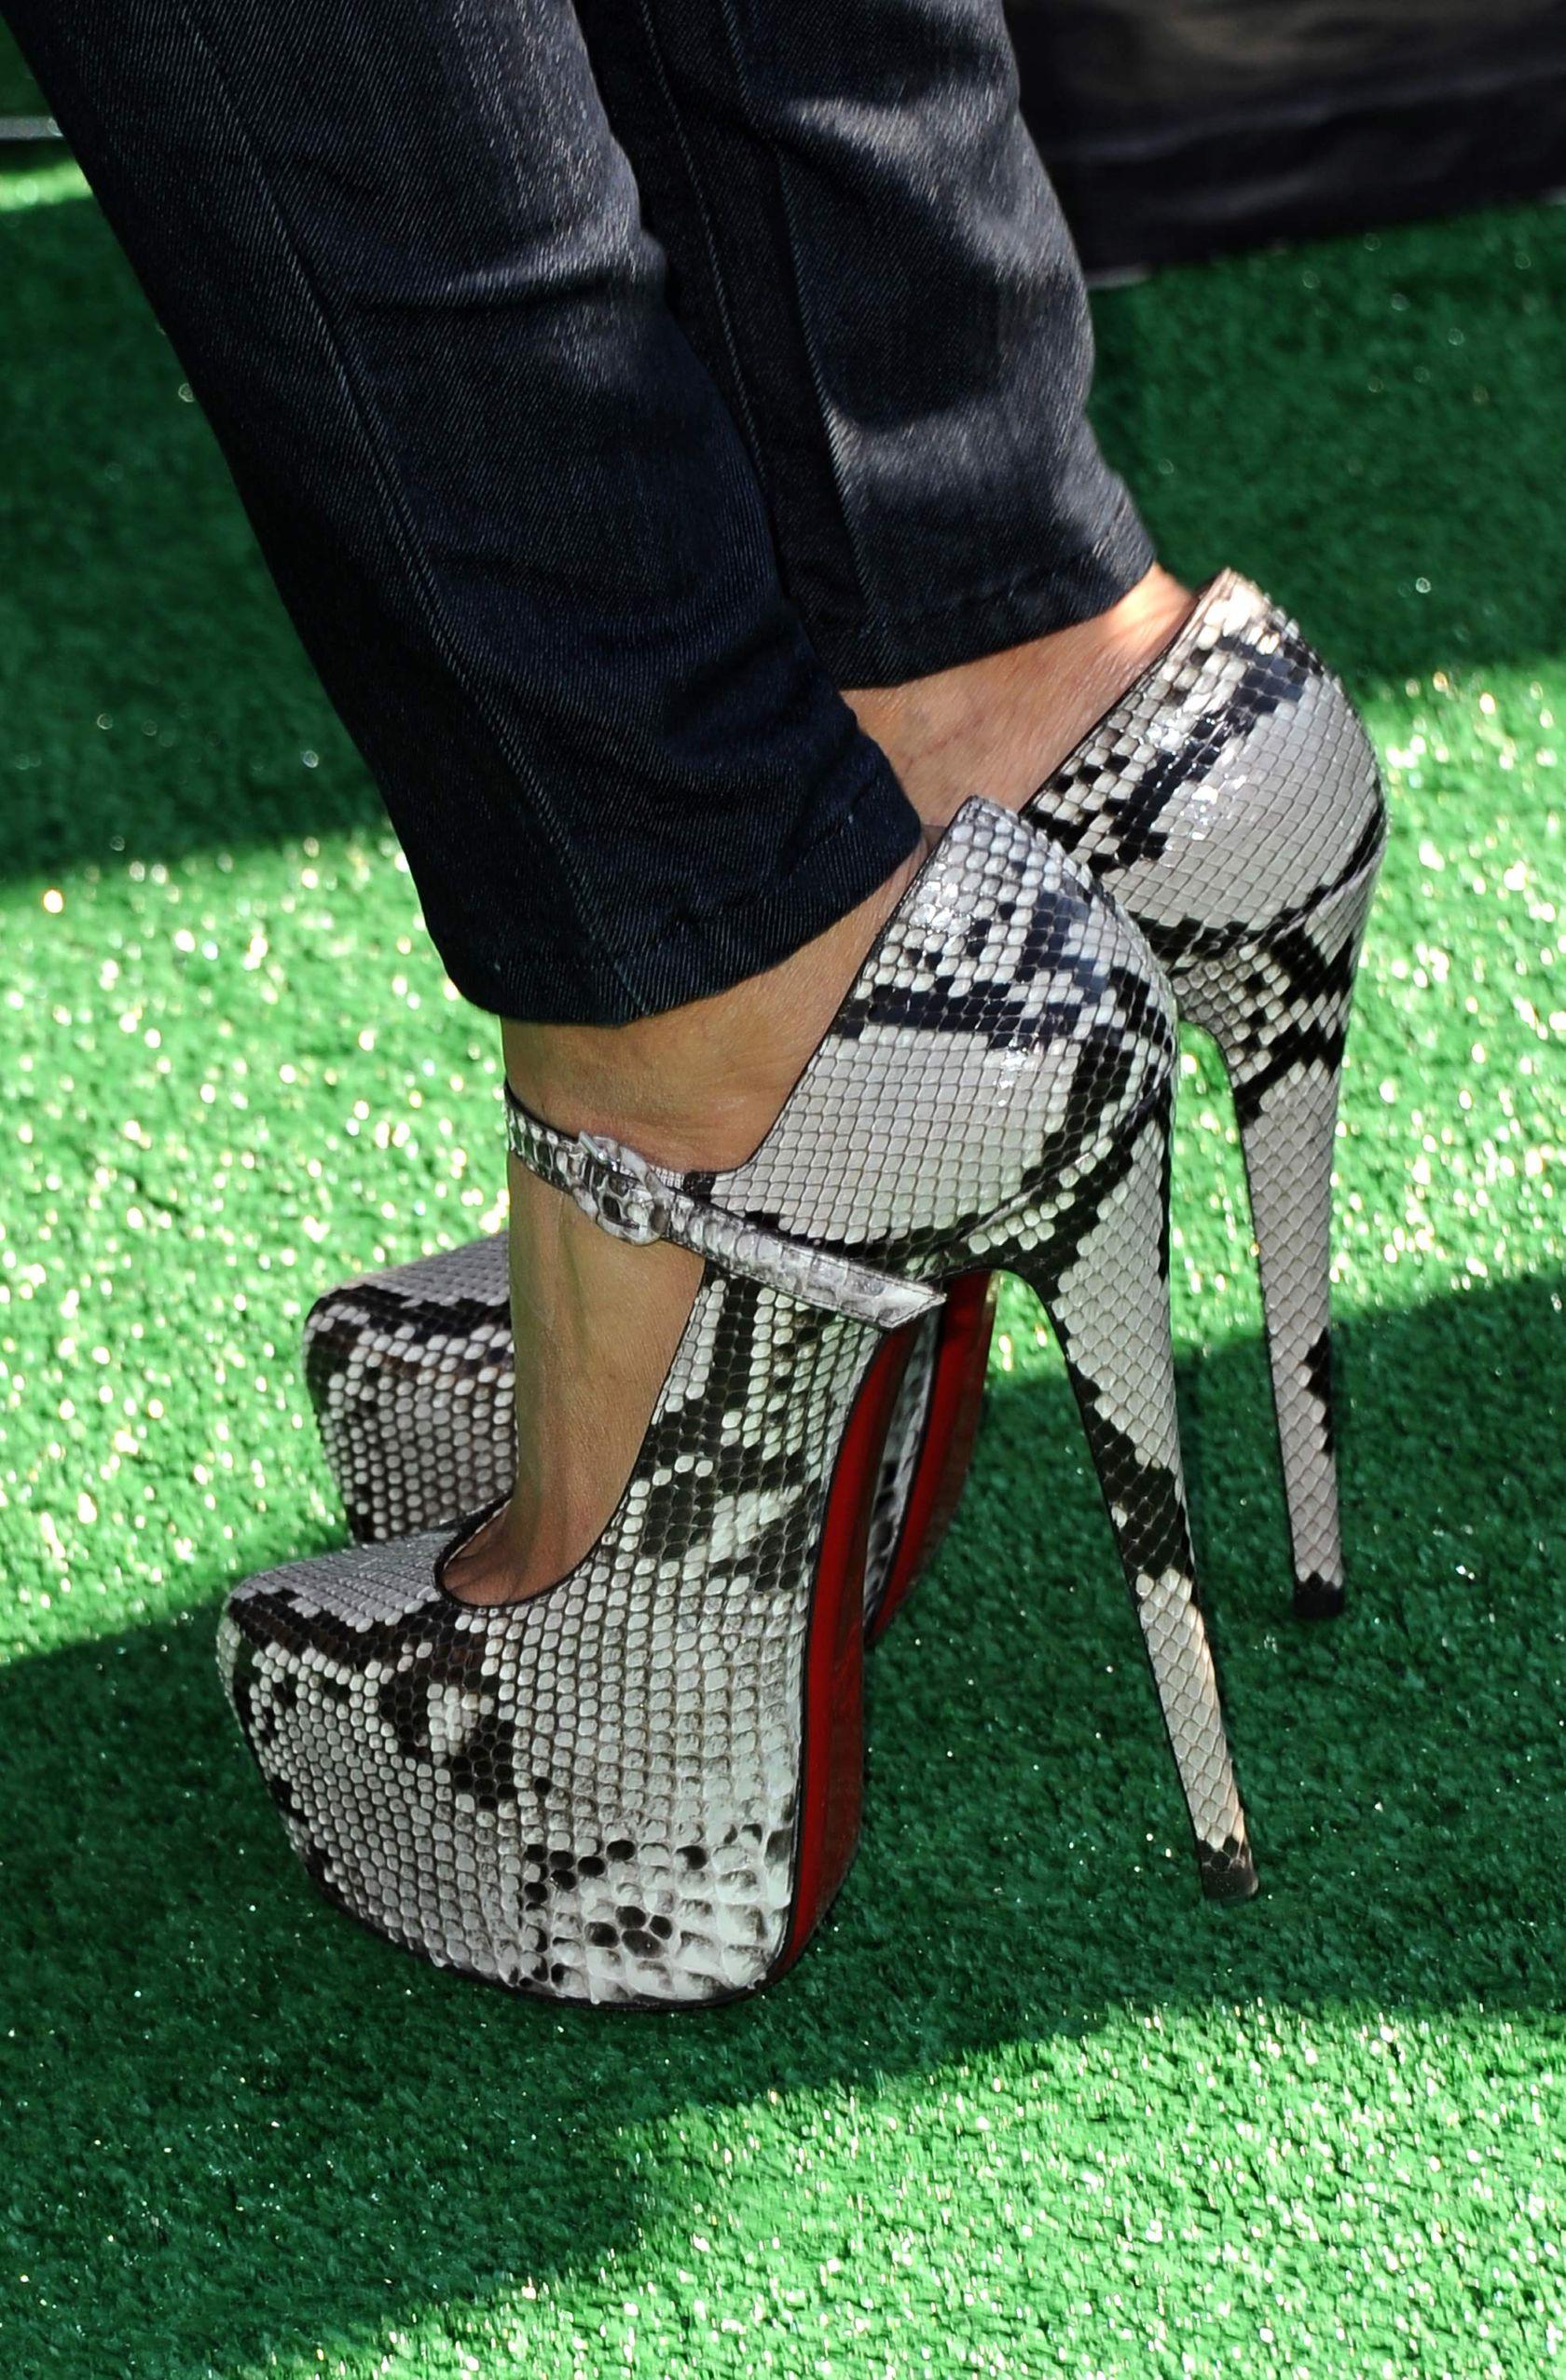 13715b7d2c11 Christian Louboutin s Lady Daf - Torturous Shoes - The Cut